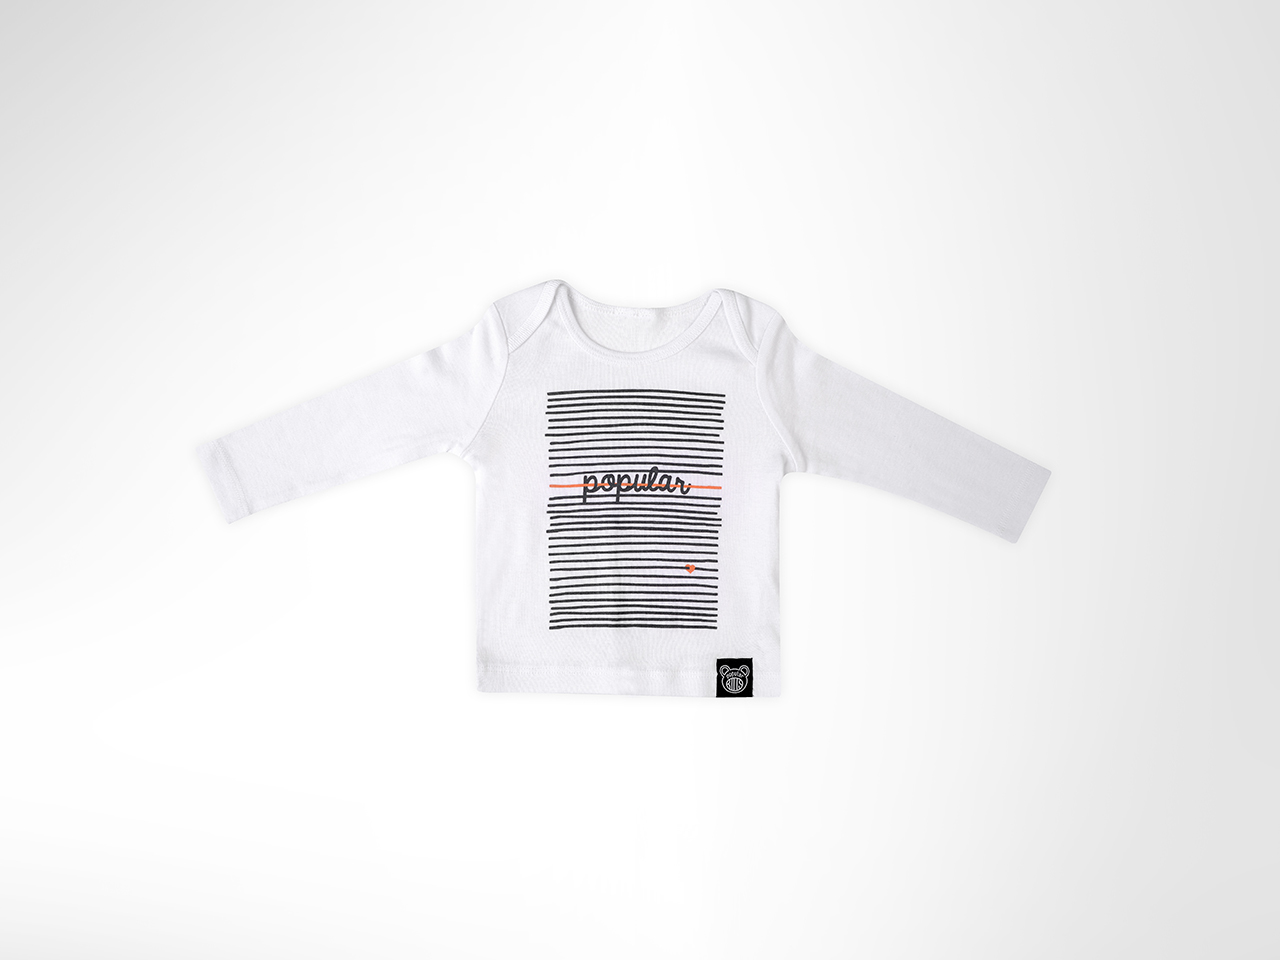 63d11c920650 Detské tričko s dlhým rukávom Love — Kompot.sk